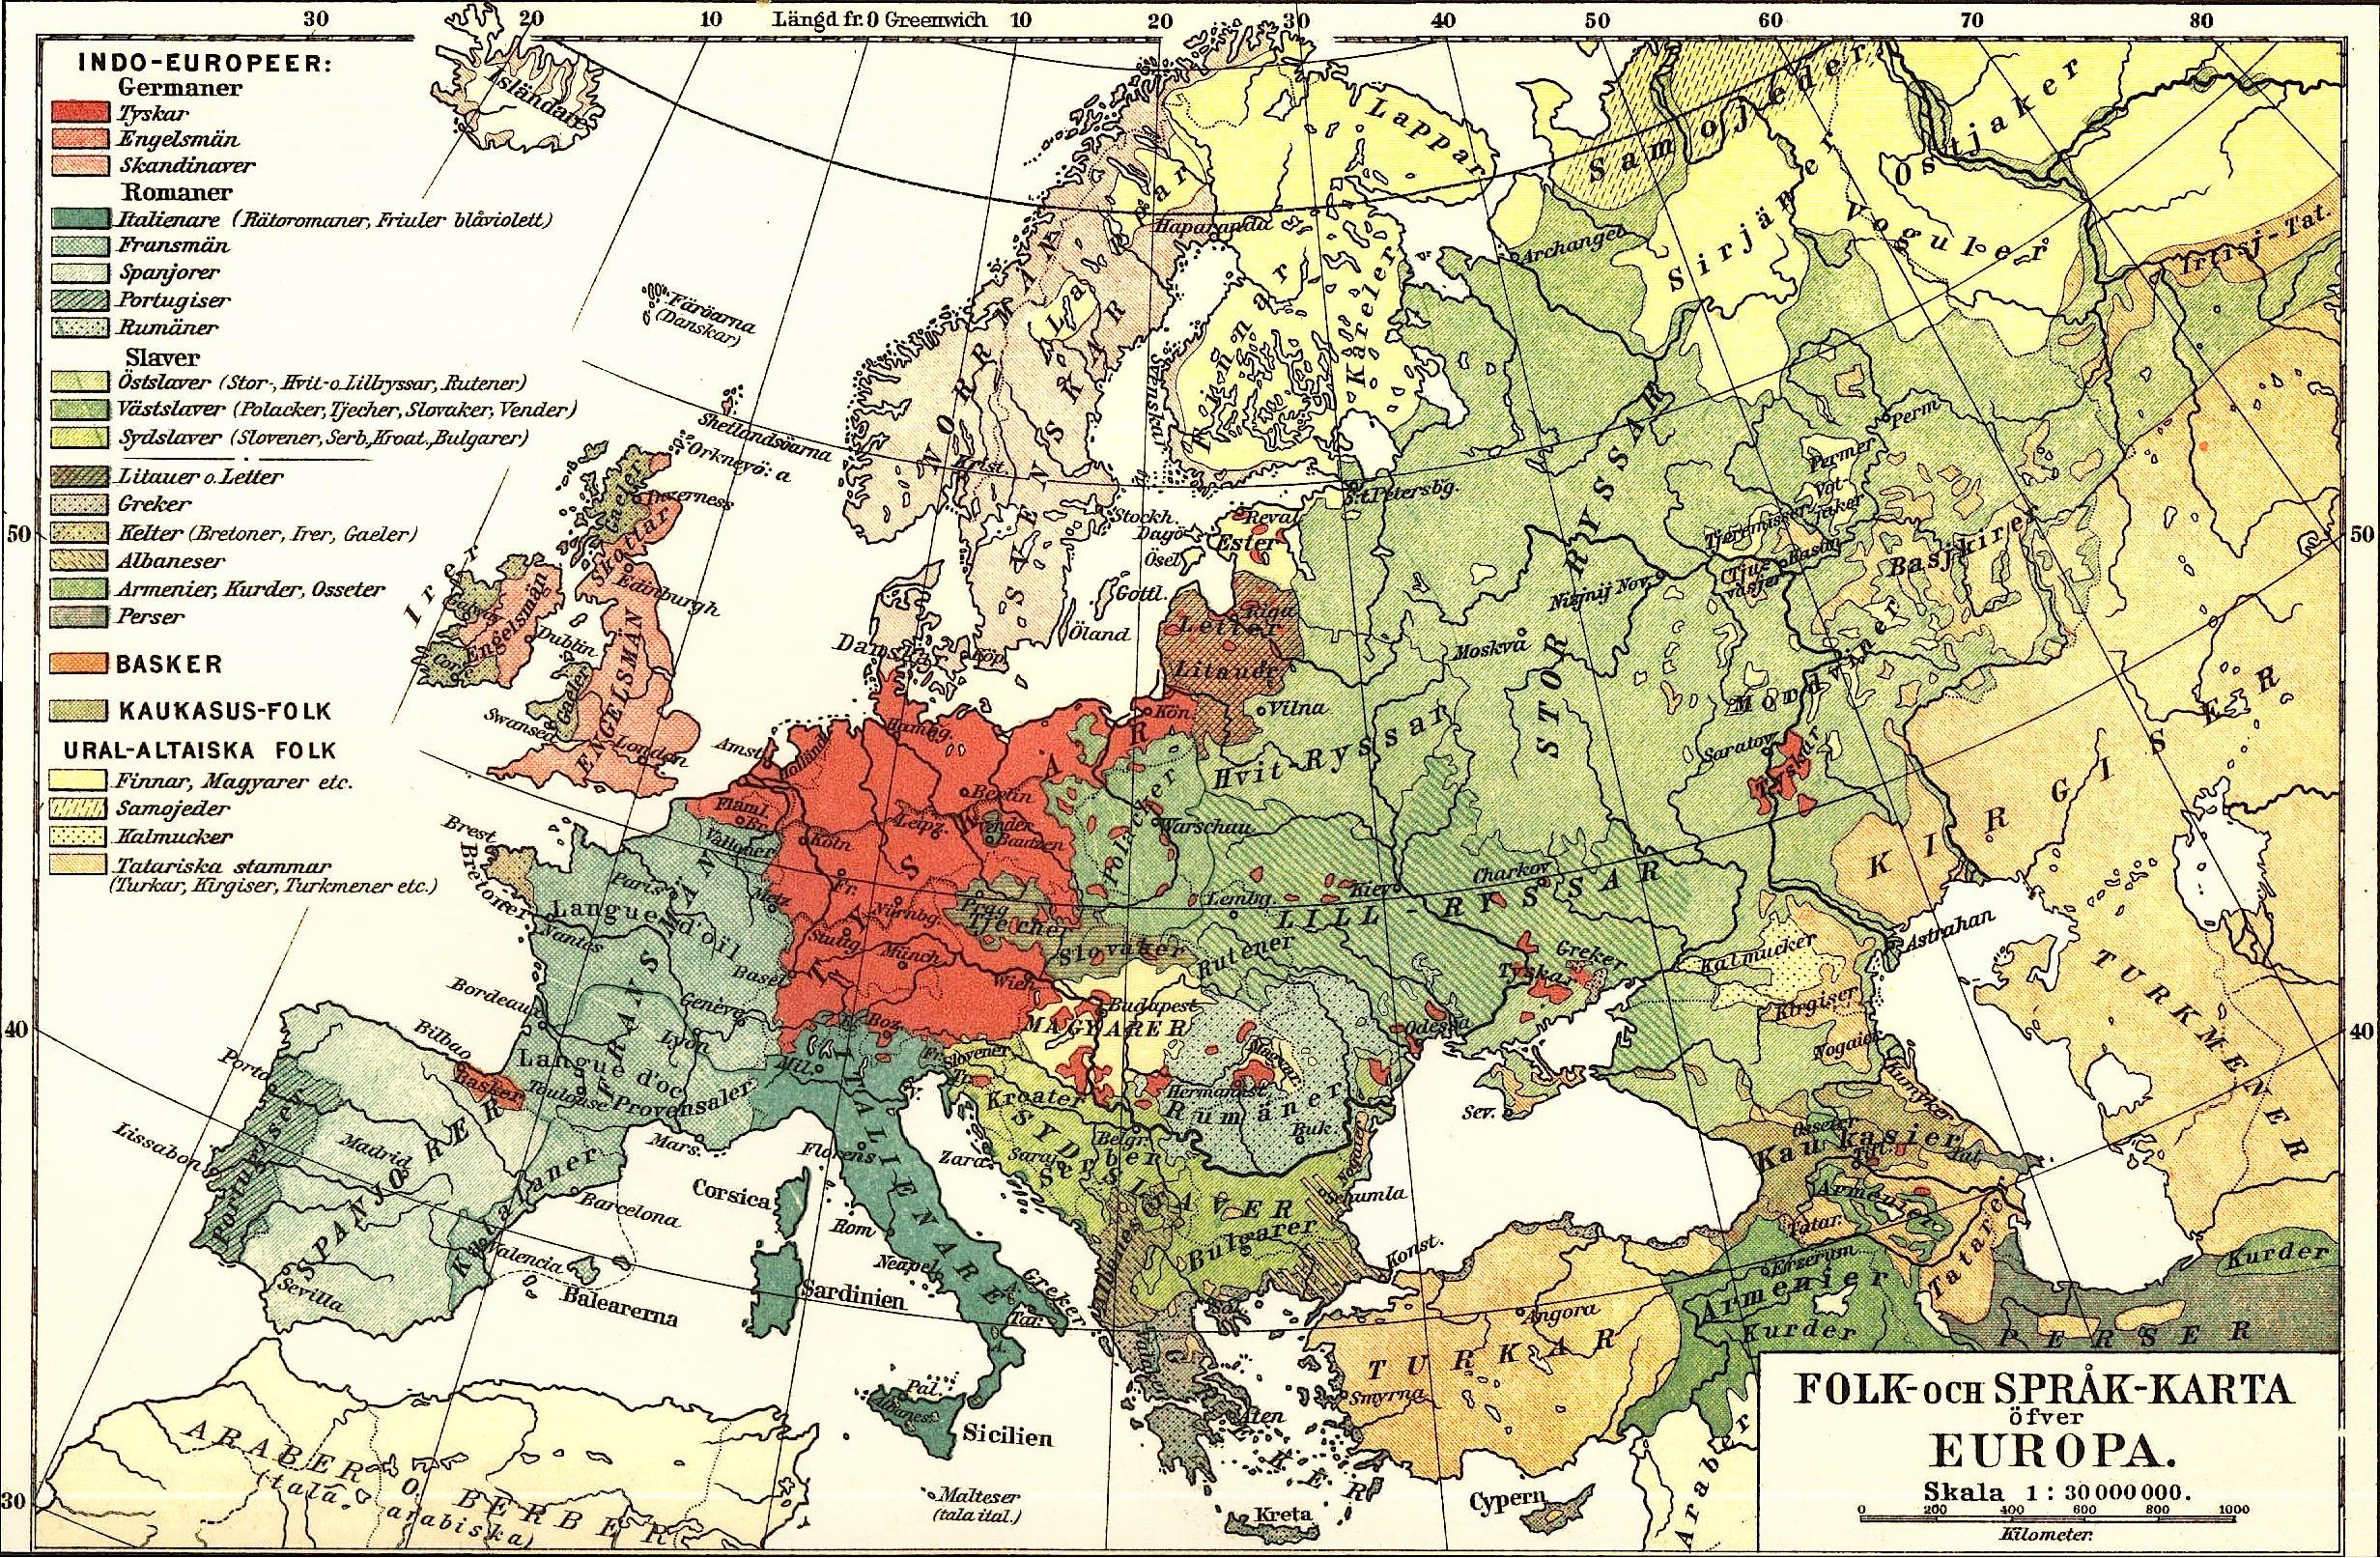 Lenguas de Europa - Wikipedia, la enciclopedia libre